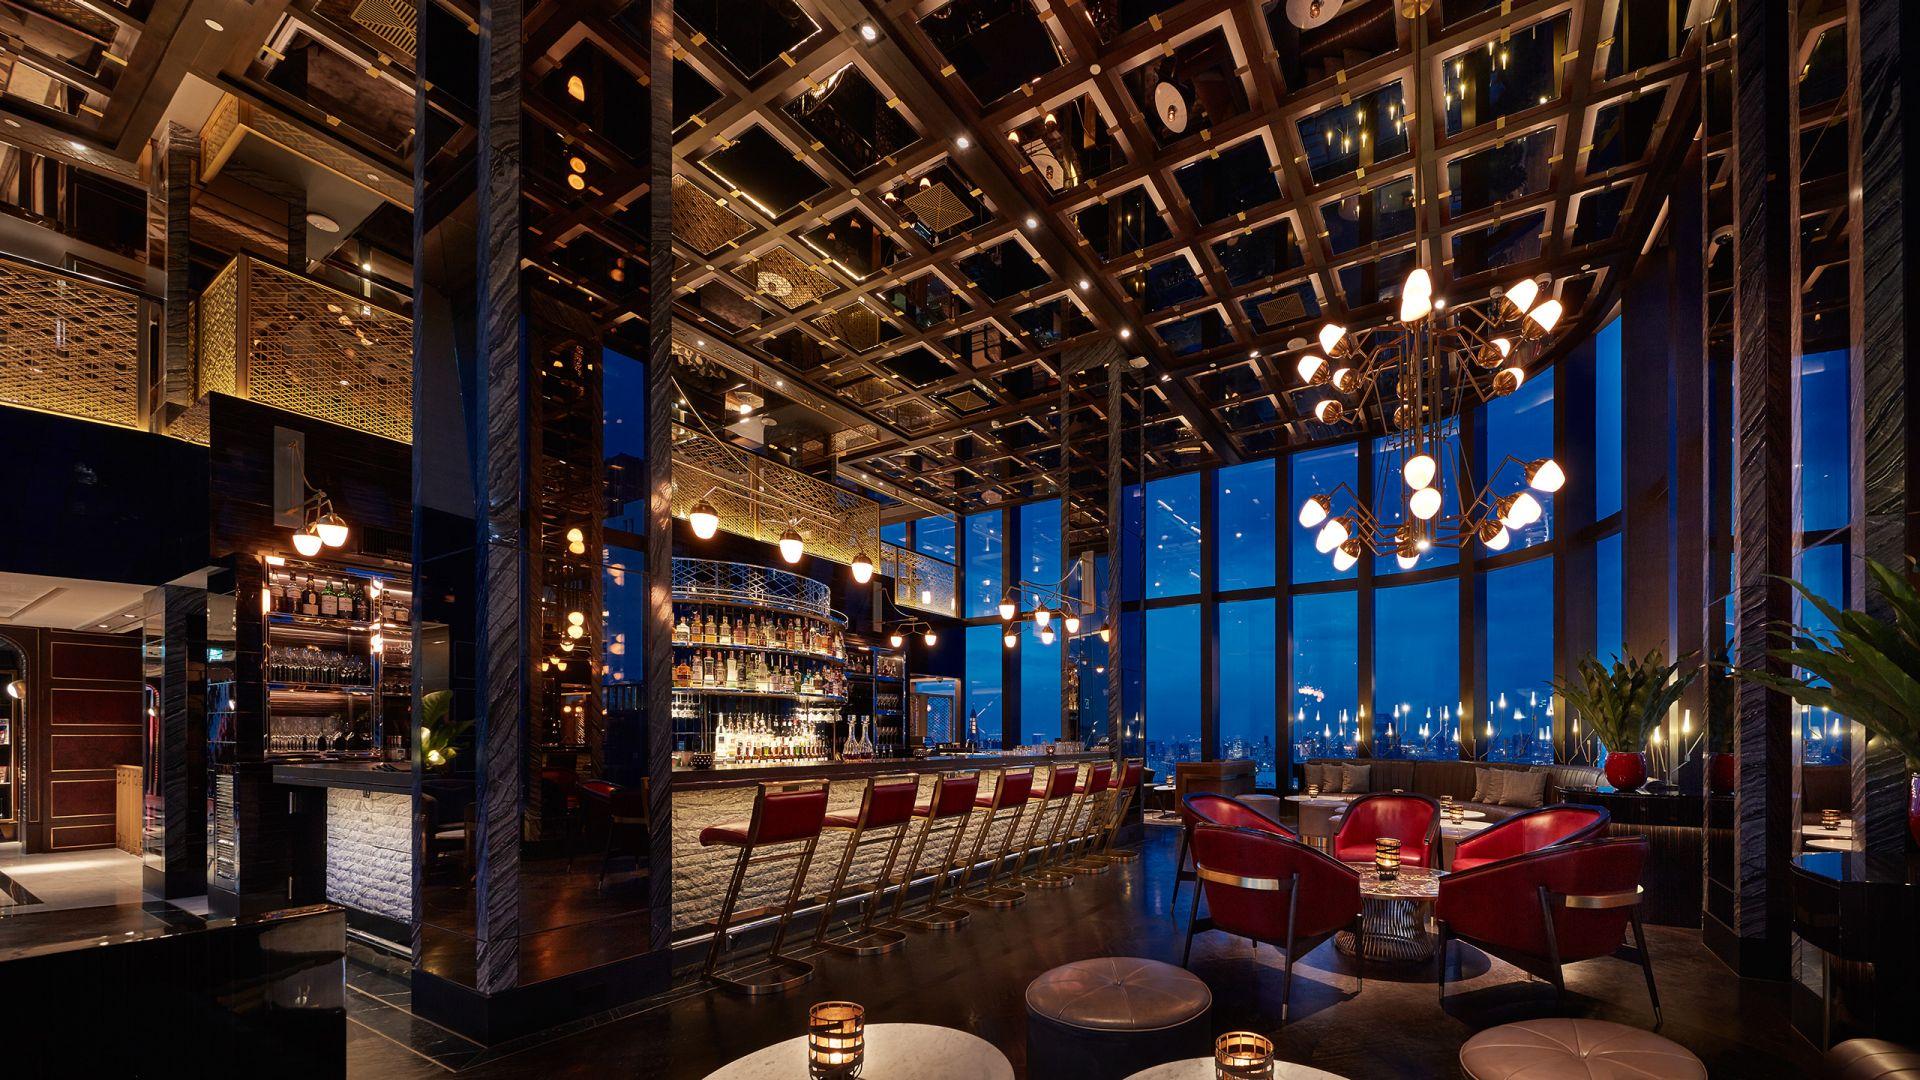 Penthouse Bar + Grill Cocktail Bar